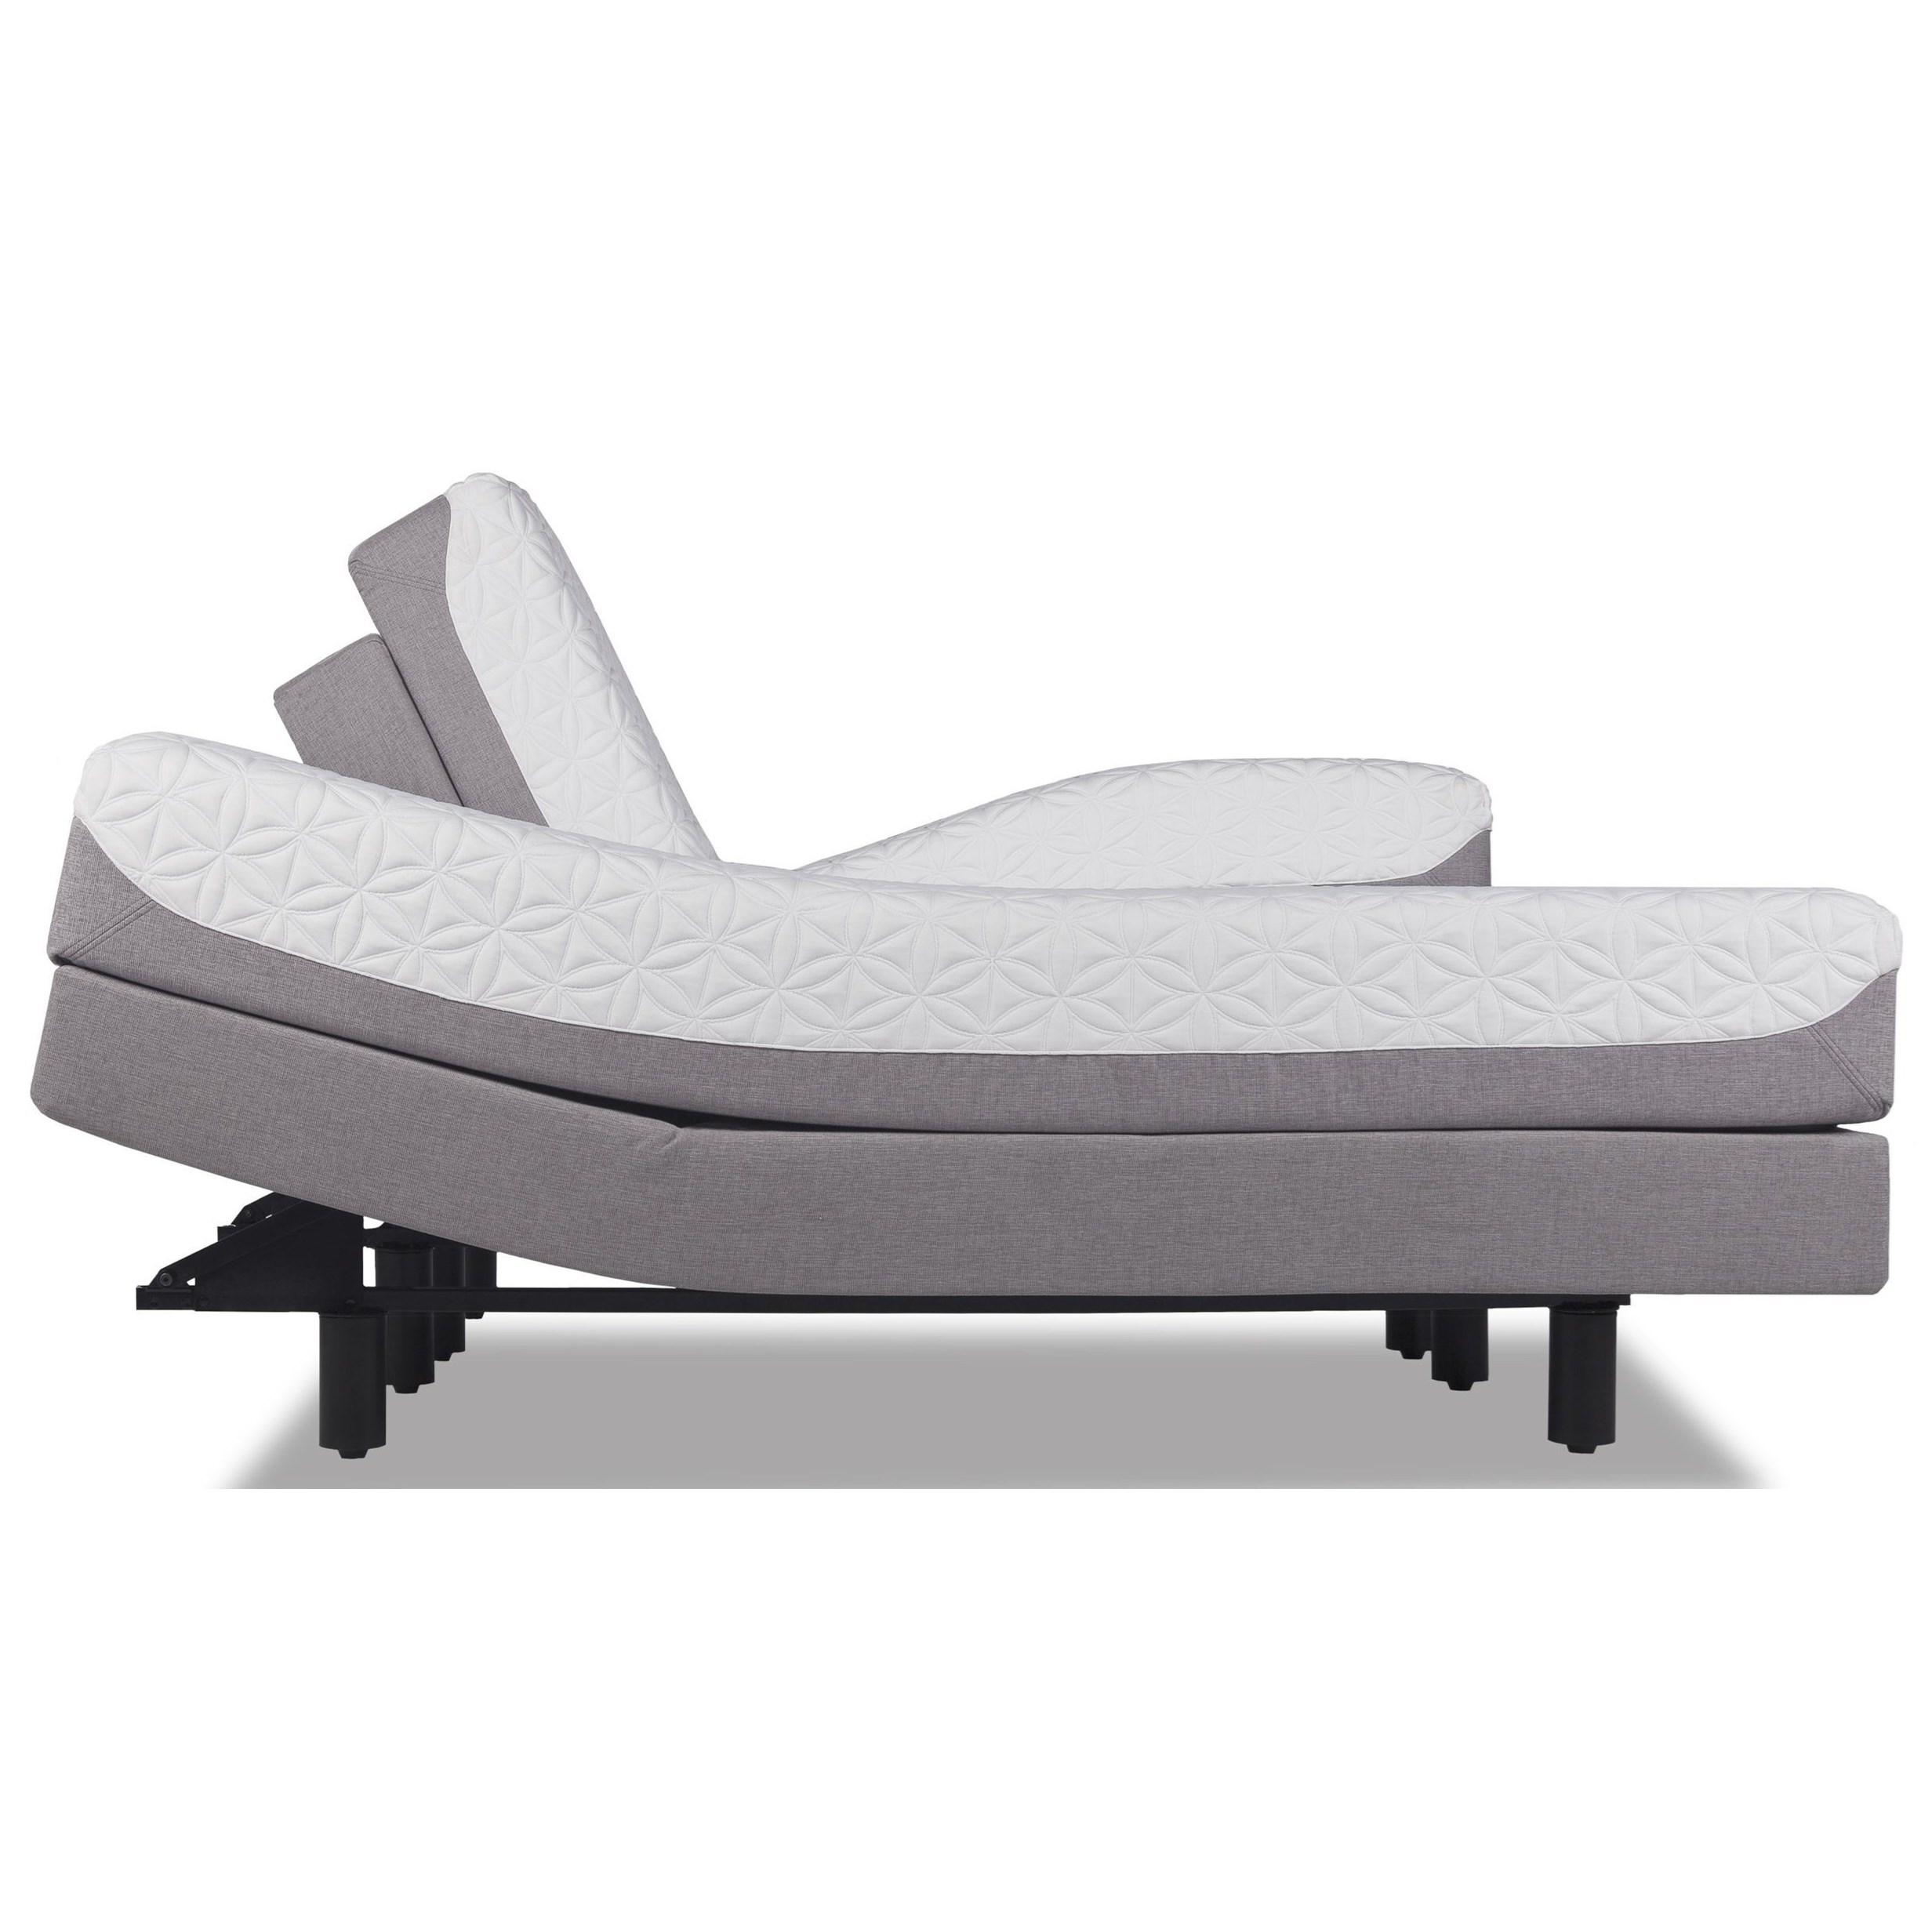 Tempur-Pedic® TEMPUR-Cloud Prima King Medium-Soft Mattress Set - Item Number: 10237170+2x25565220